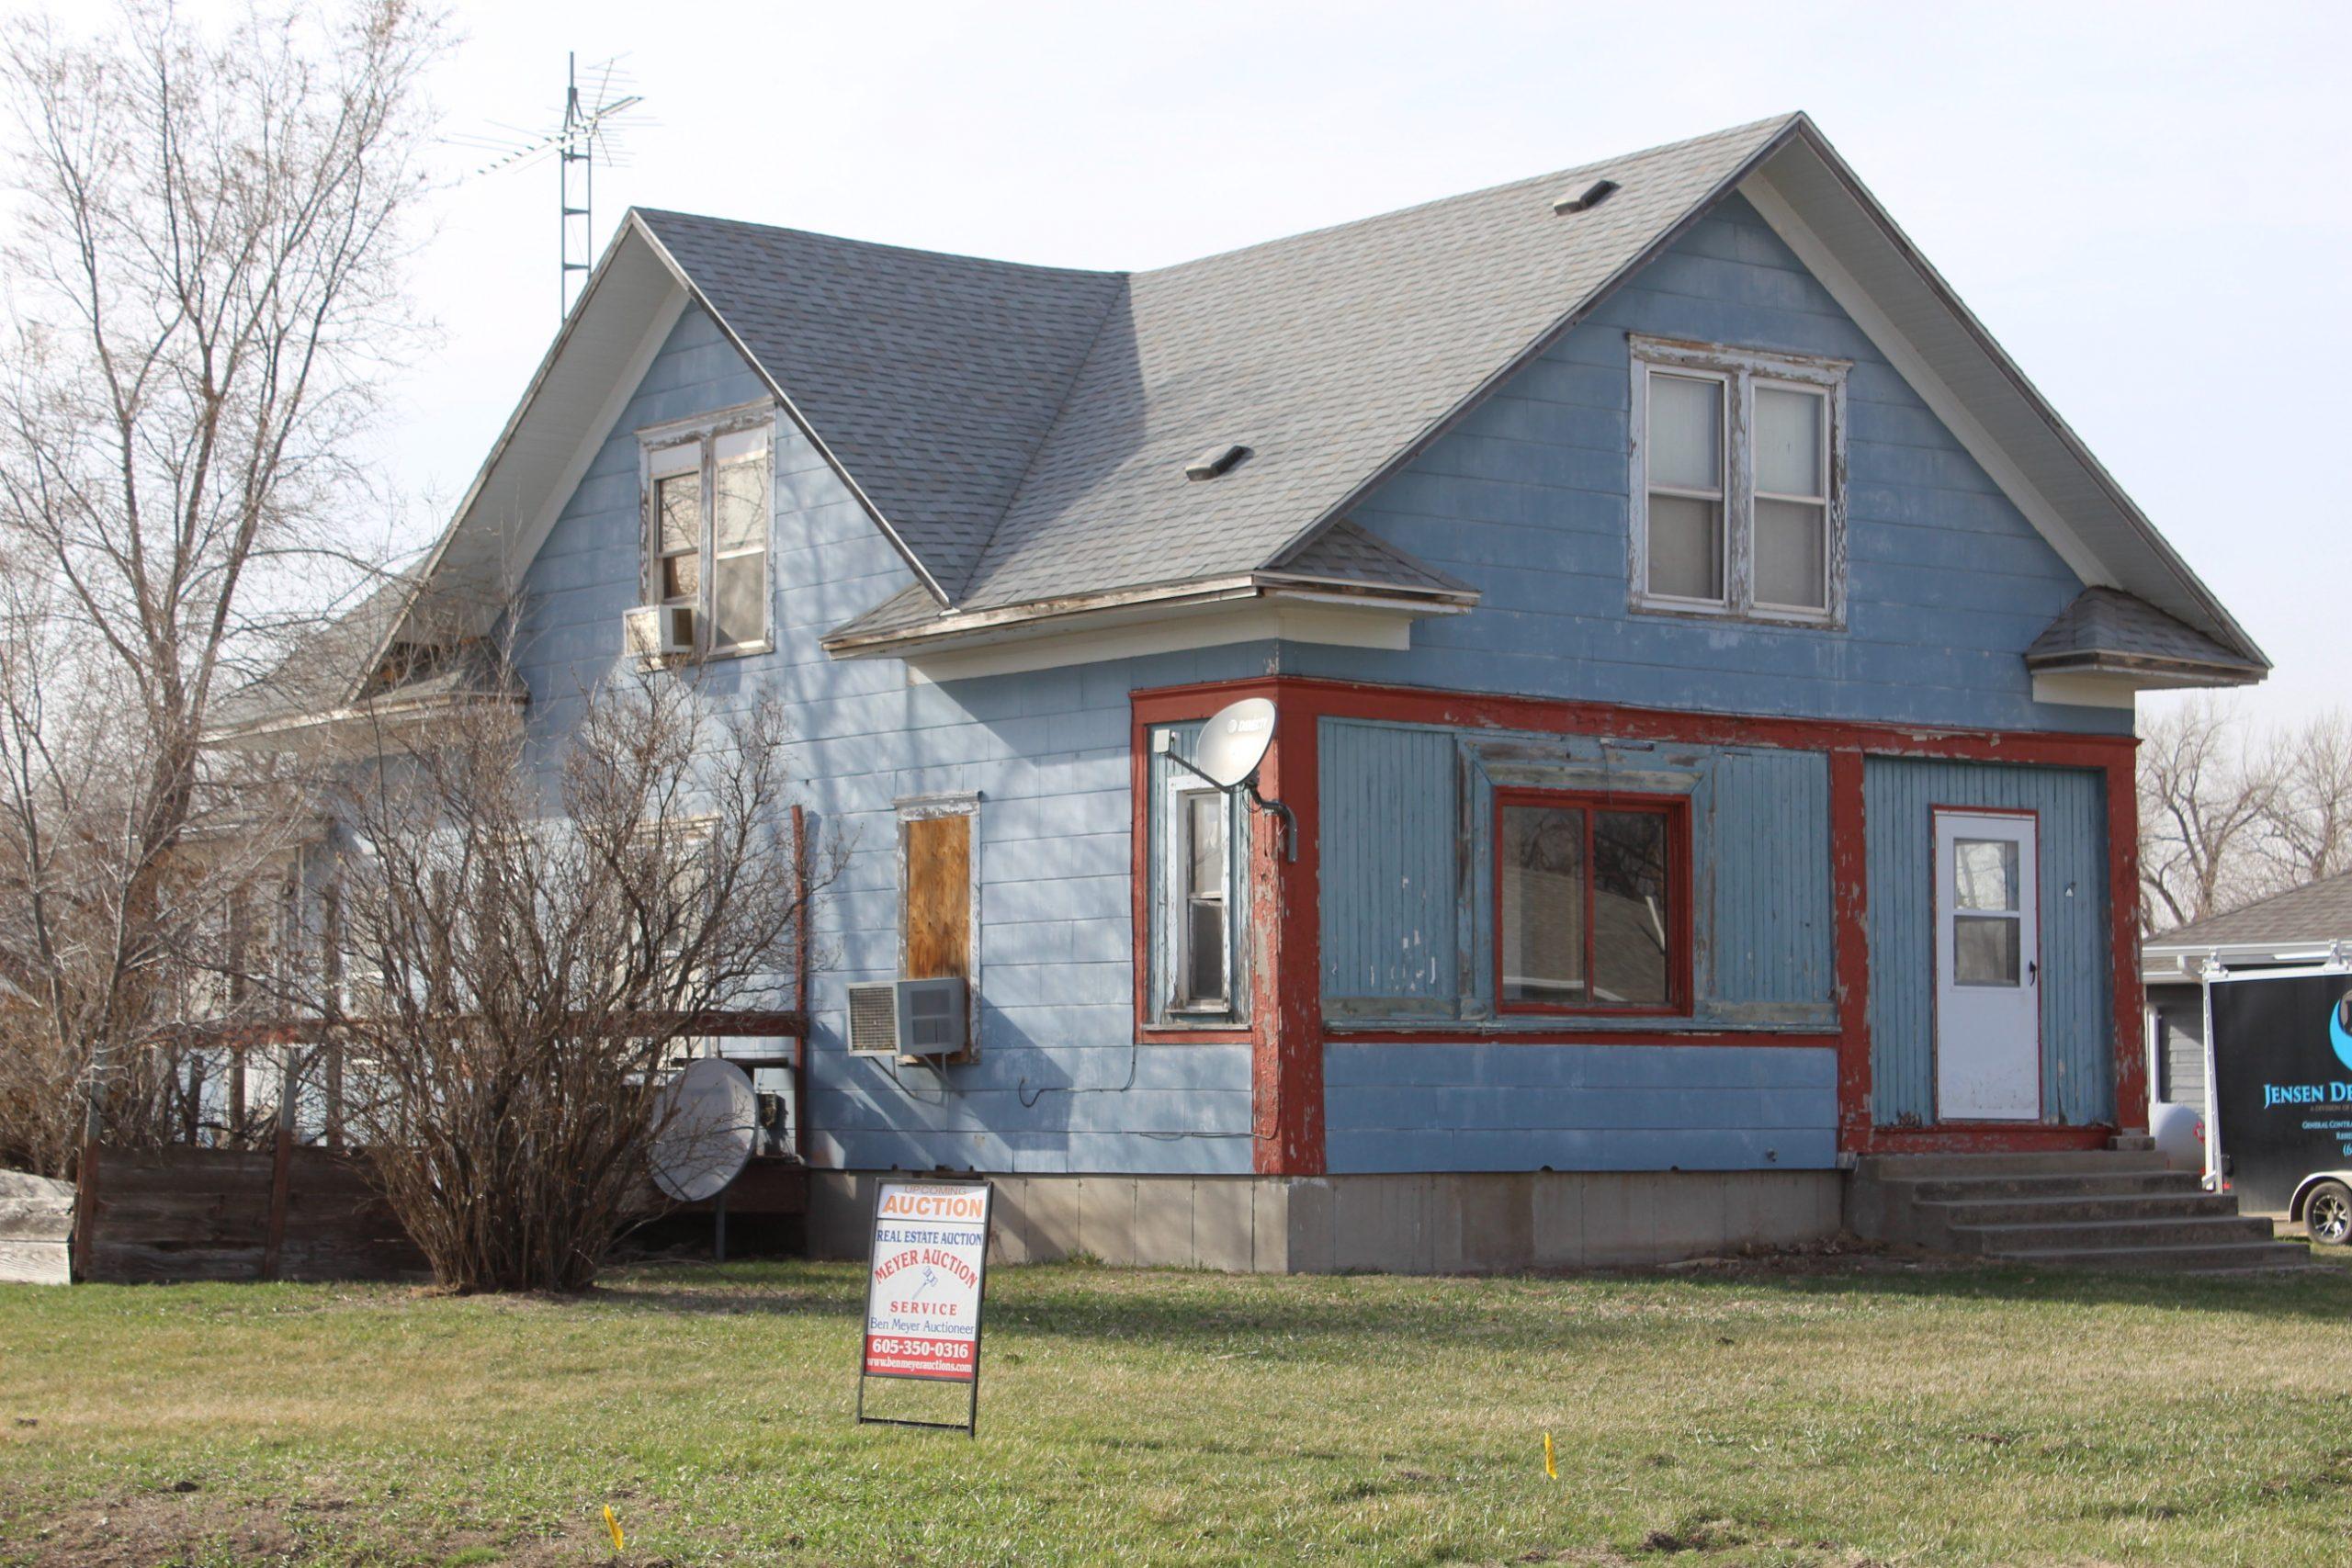 4/8/21 Real Estate Auction  –                      275 Pennington Ave SW Huron, SD 57350